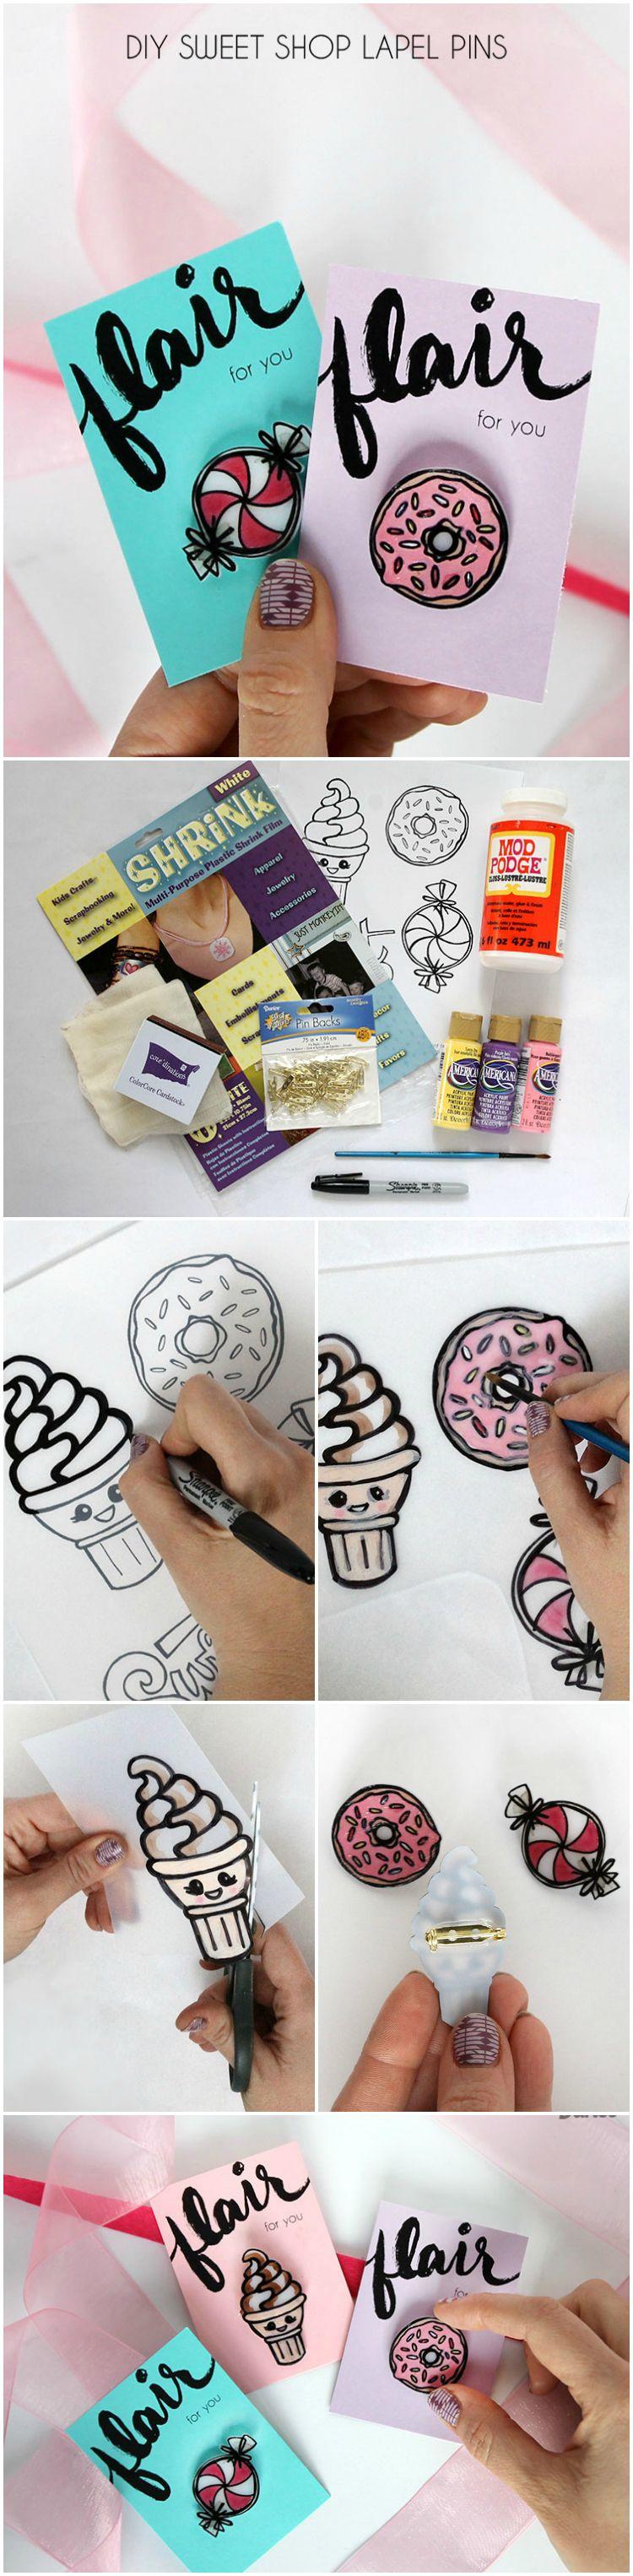 homemade pins inspired by your favorite sweets darice kreativ mit teenagern diy basteln. Black Bedroom Furniture Sets. Home Design Ideas